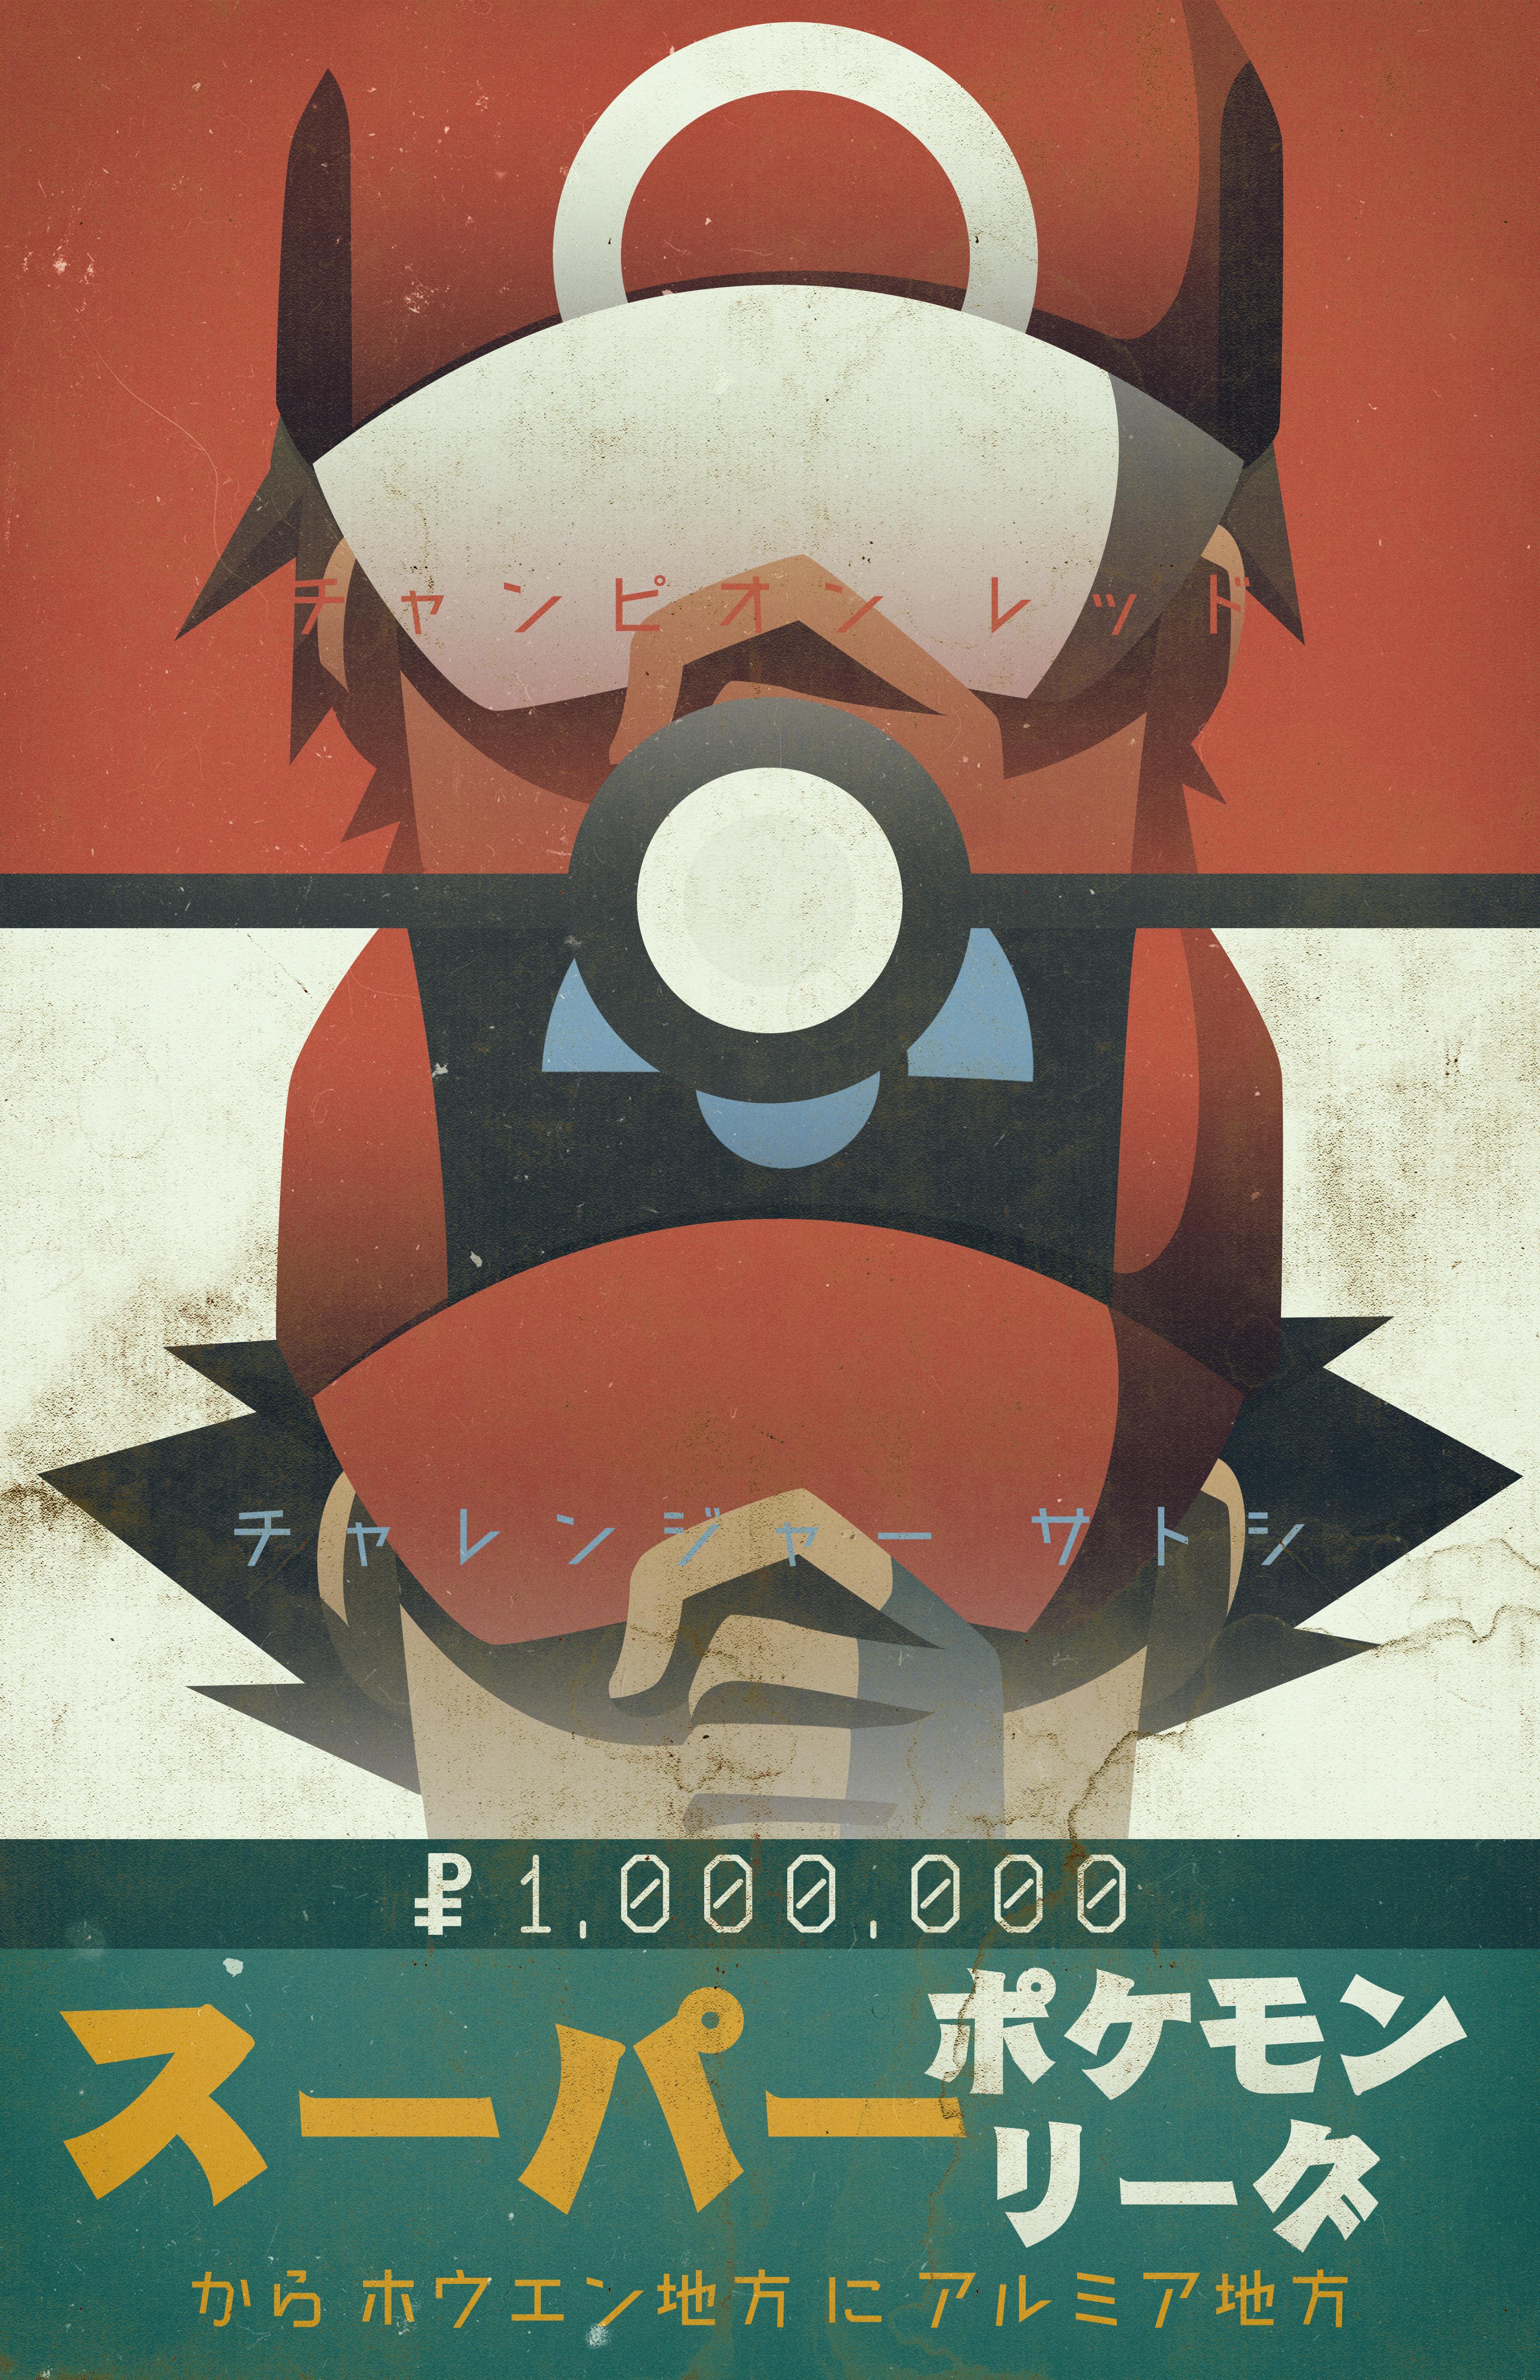 Red vs Ash   Pokemon [Poster] by PlushGiant